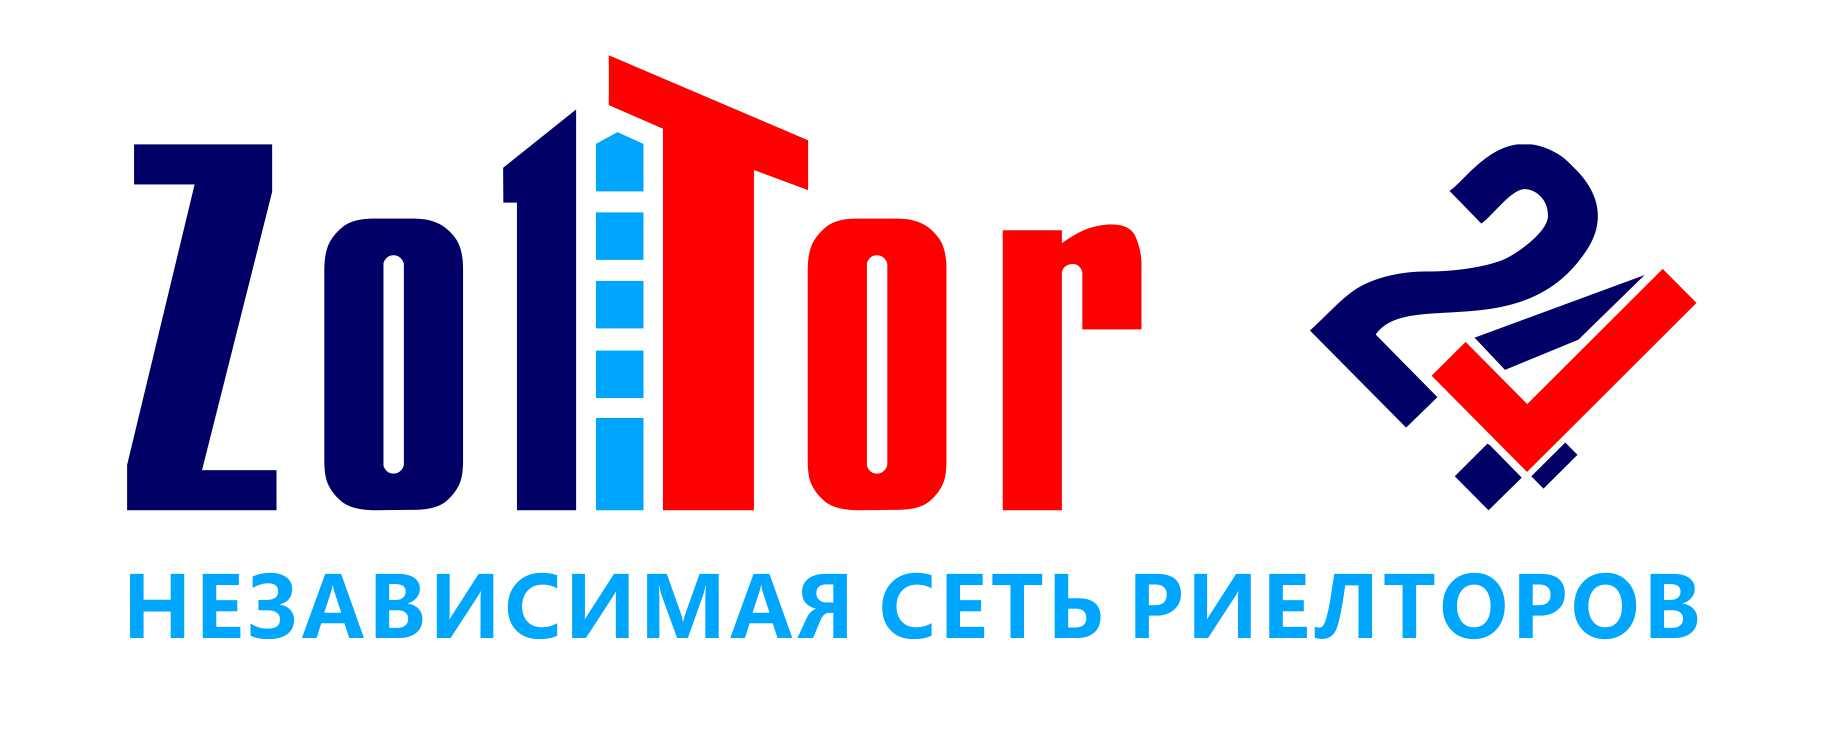 Логотип и фирменный стиль ZolTor24 фото f_7095c8b9dfa35472.jpg